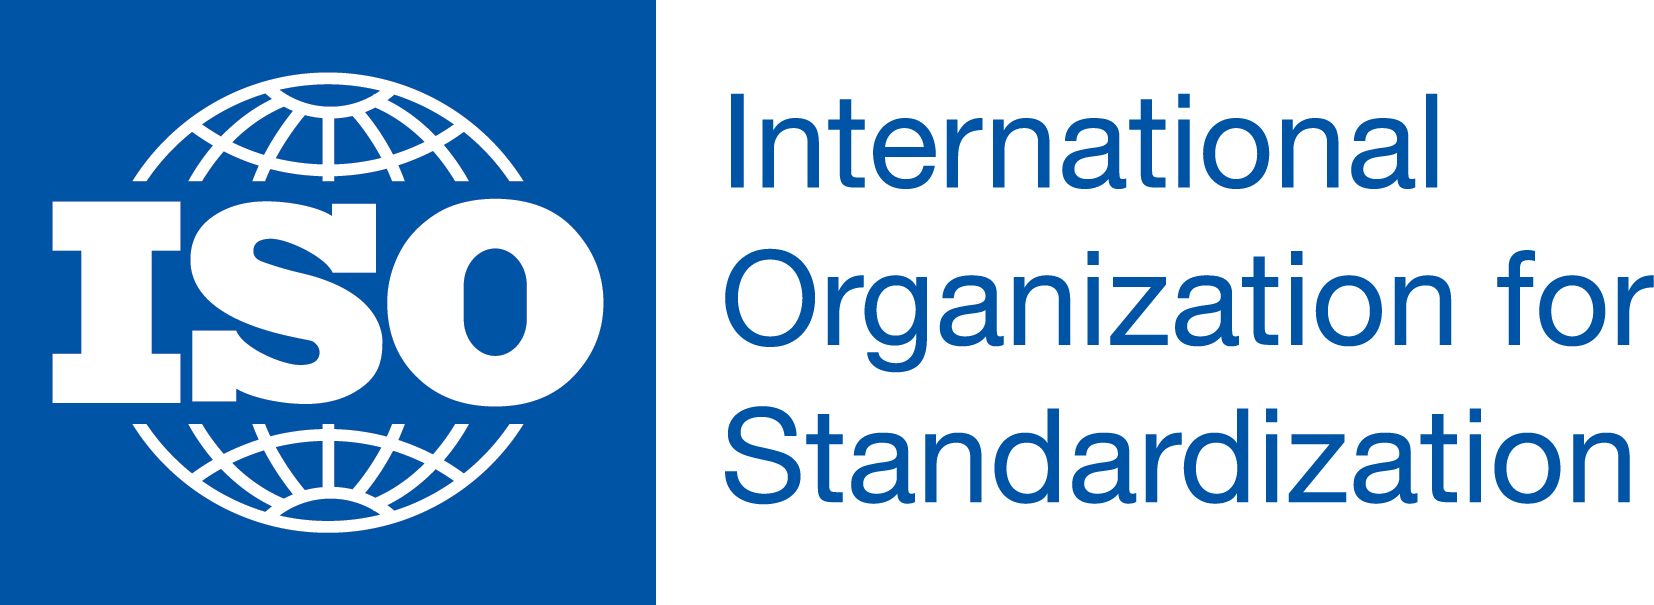 ISO 18001 Accreditation logo